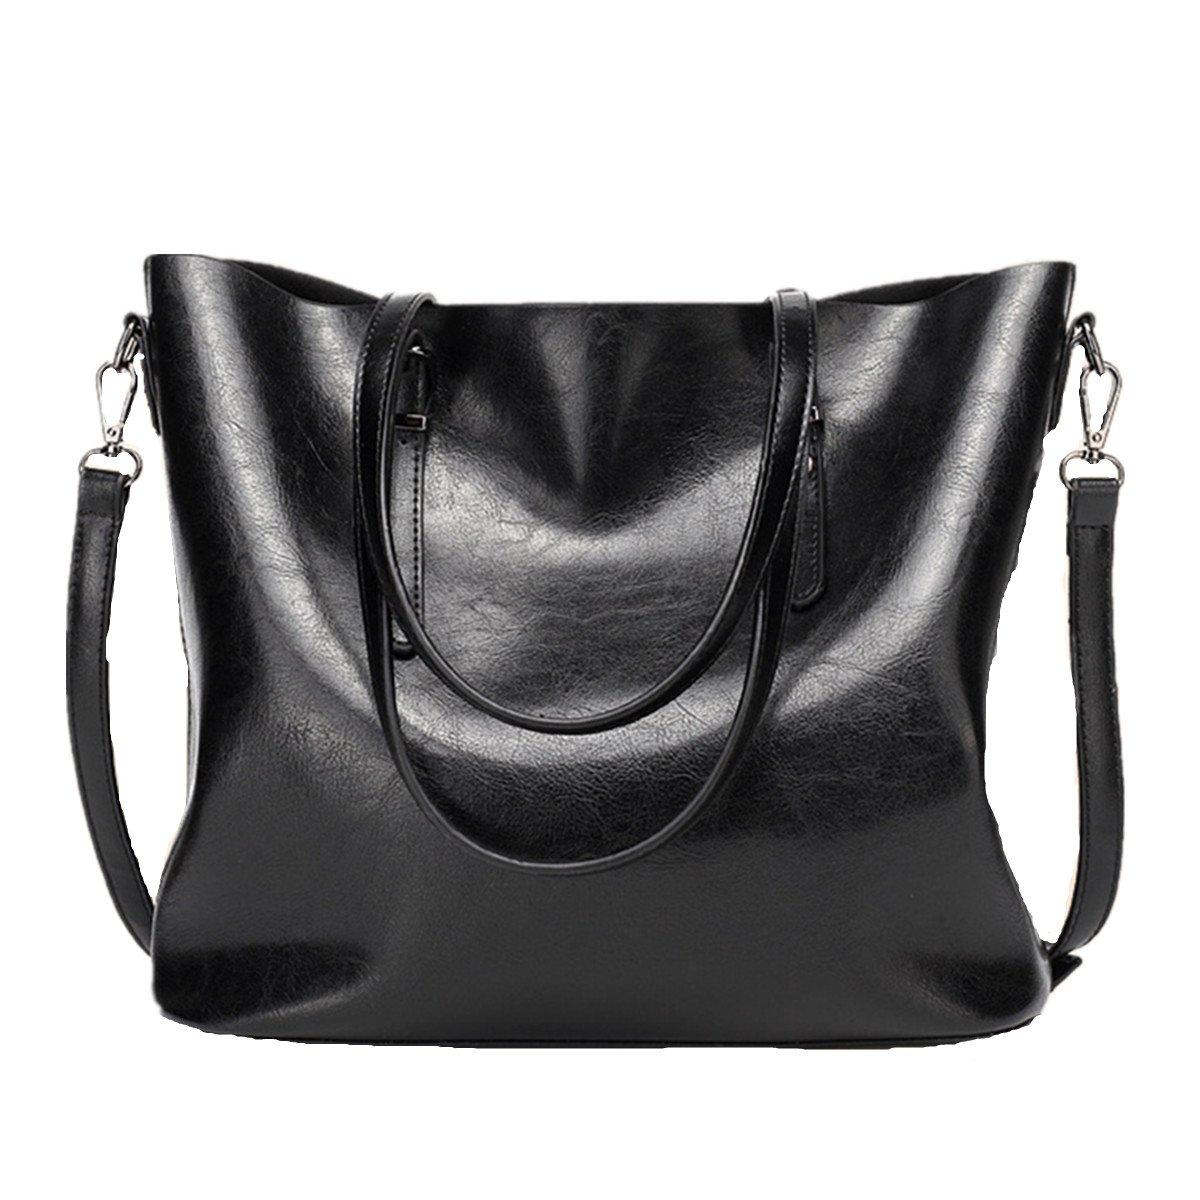 c35acf8f96344 Amazon.com  Smilecoco Women Bag Casual Vintage Shoulder Bag Handbags Cross  Body Bag Large Capacity Bags